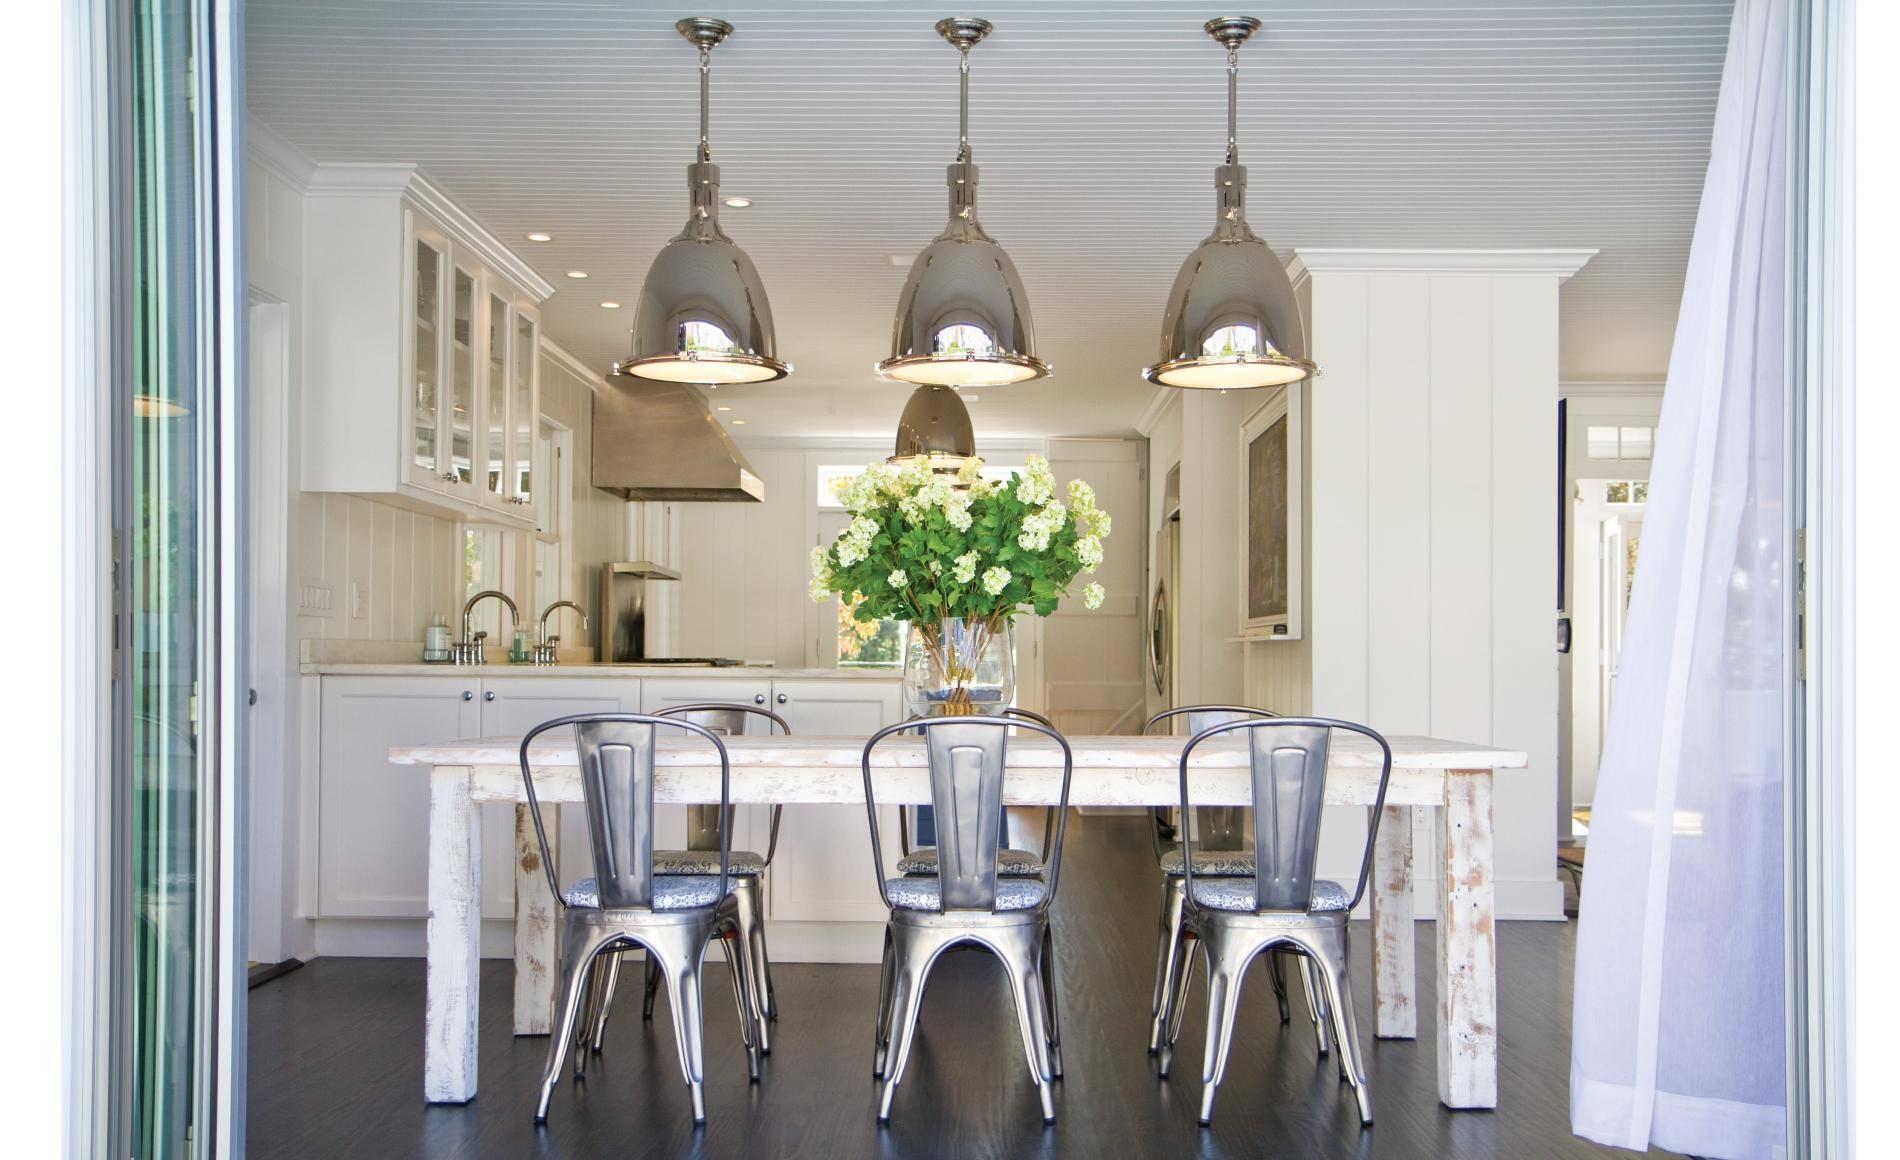 Lighting Style Ideas : Beach House Pendant Lighting Decorations Regarding Beach House Pendant Lighting (View 4 of 15)